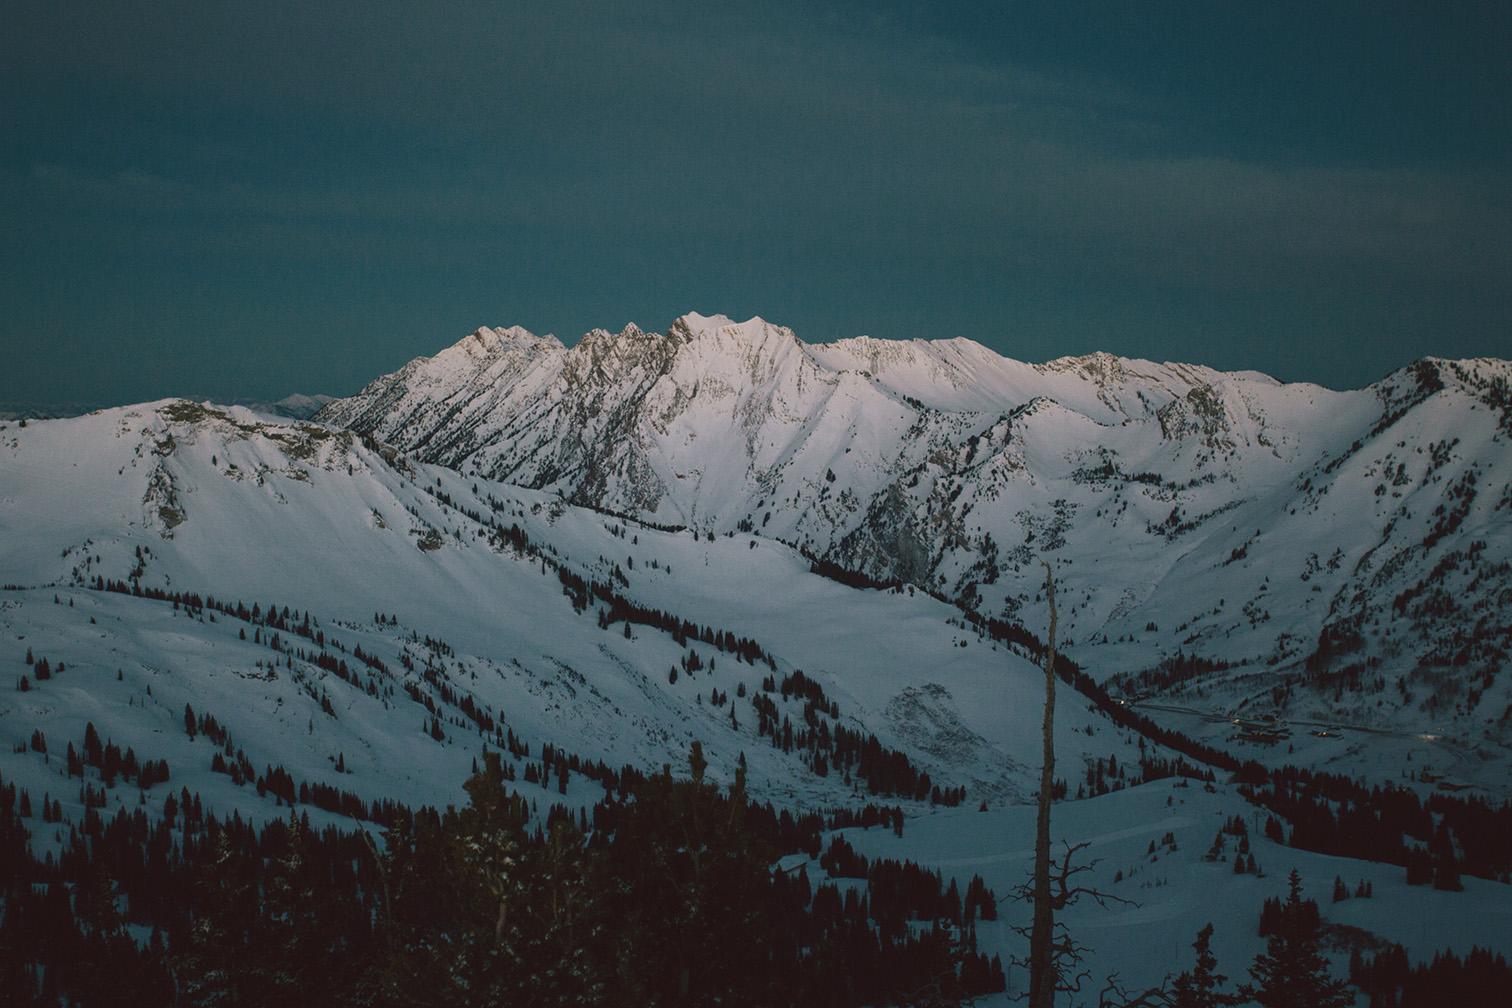 little-cottonwood-canyon-winter-dawn-sunrise-mt-superior-monte-cristo.jpg